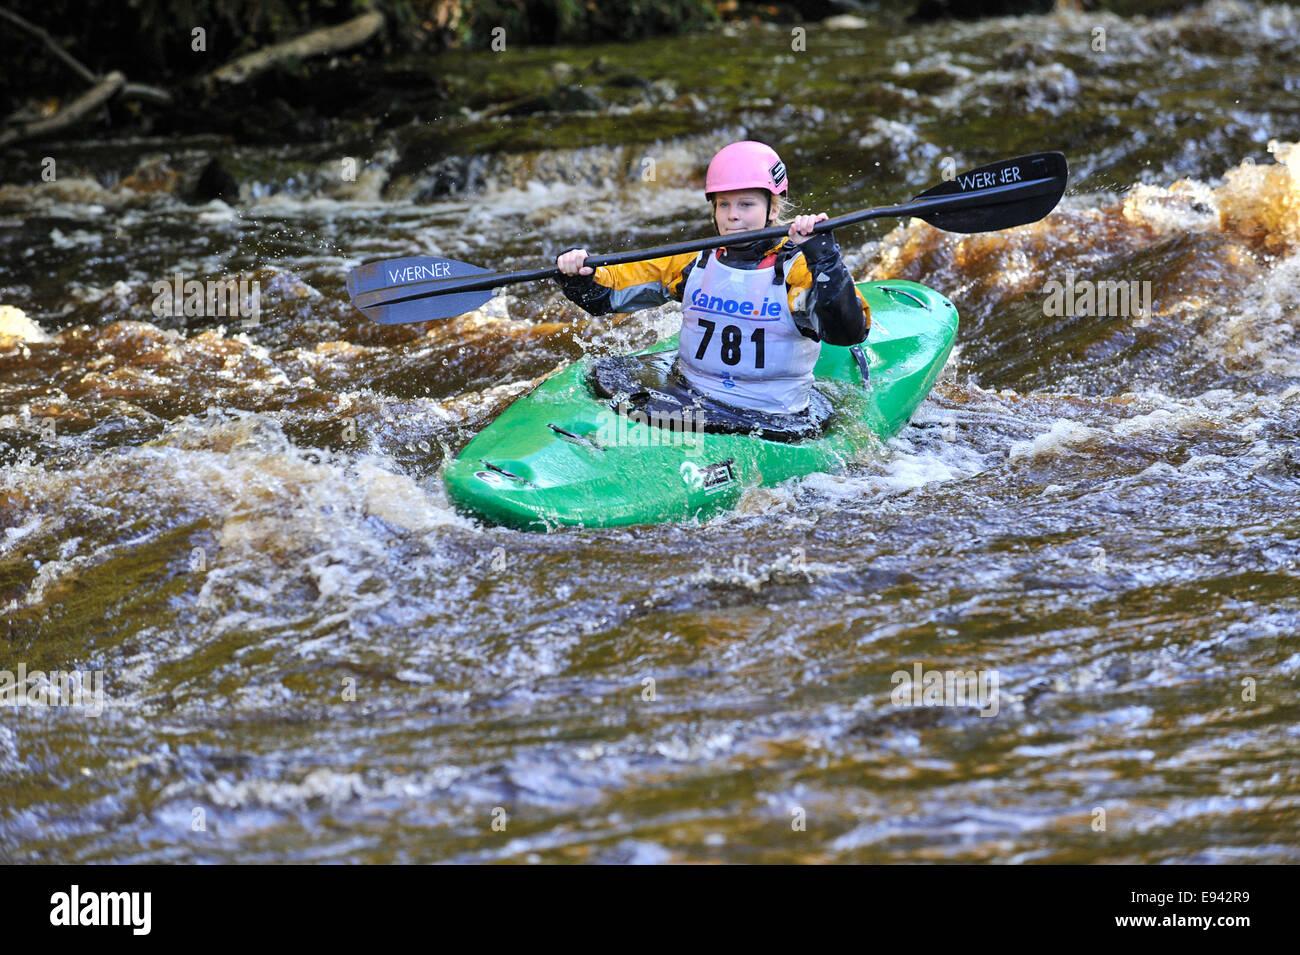 Stock Photo - Kayaking competition, Buncrana, County Donegal, Ireland.  ©George Sweeney /Alamy - Stock Image